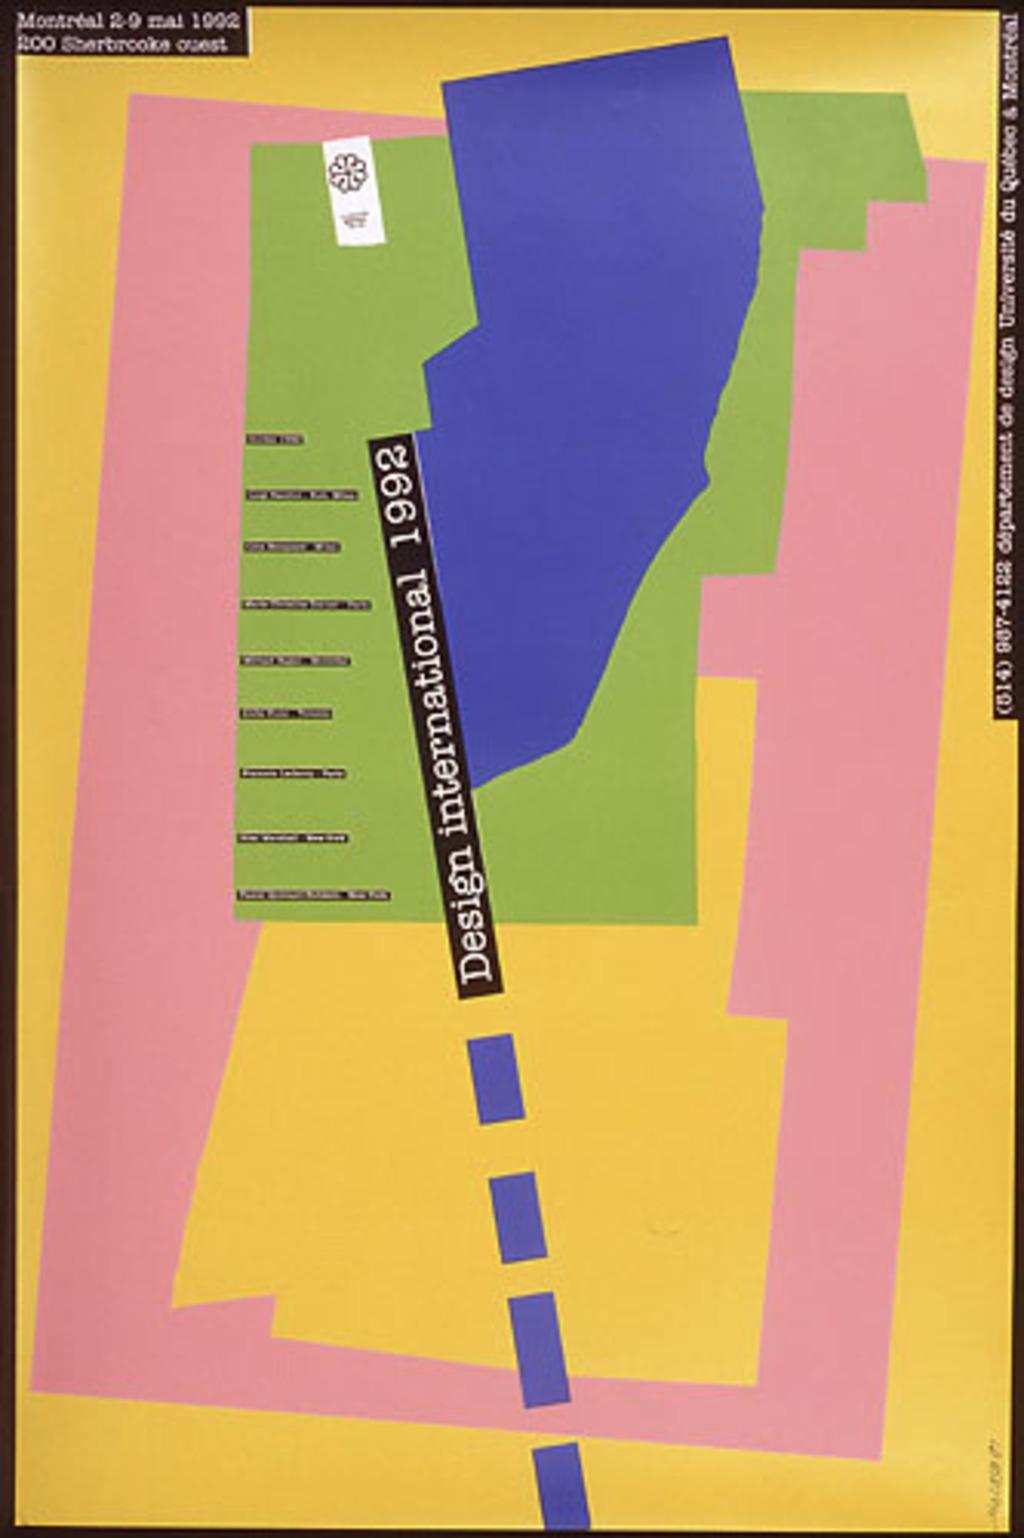 Design International '92